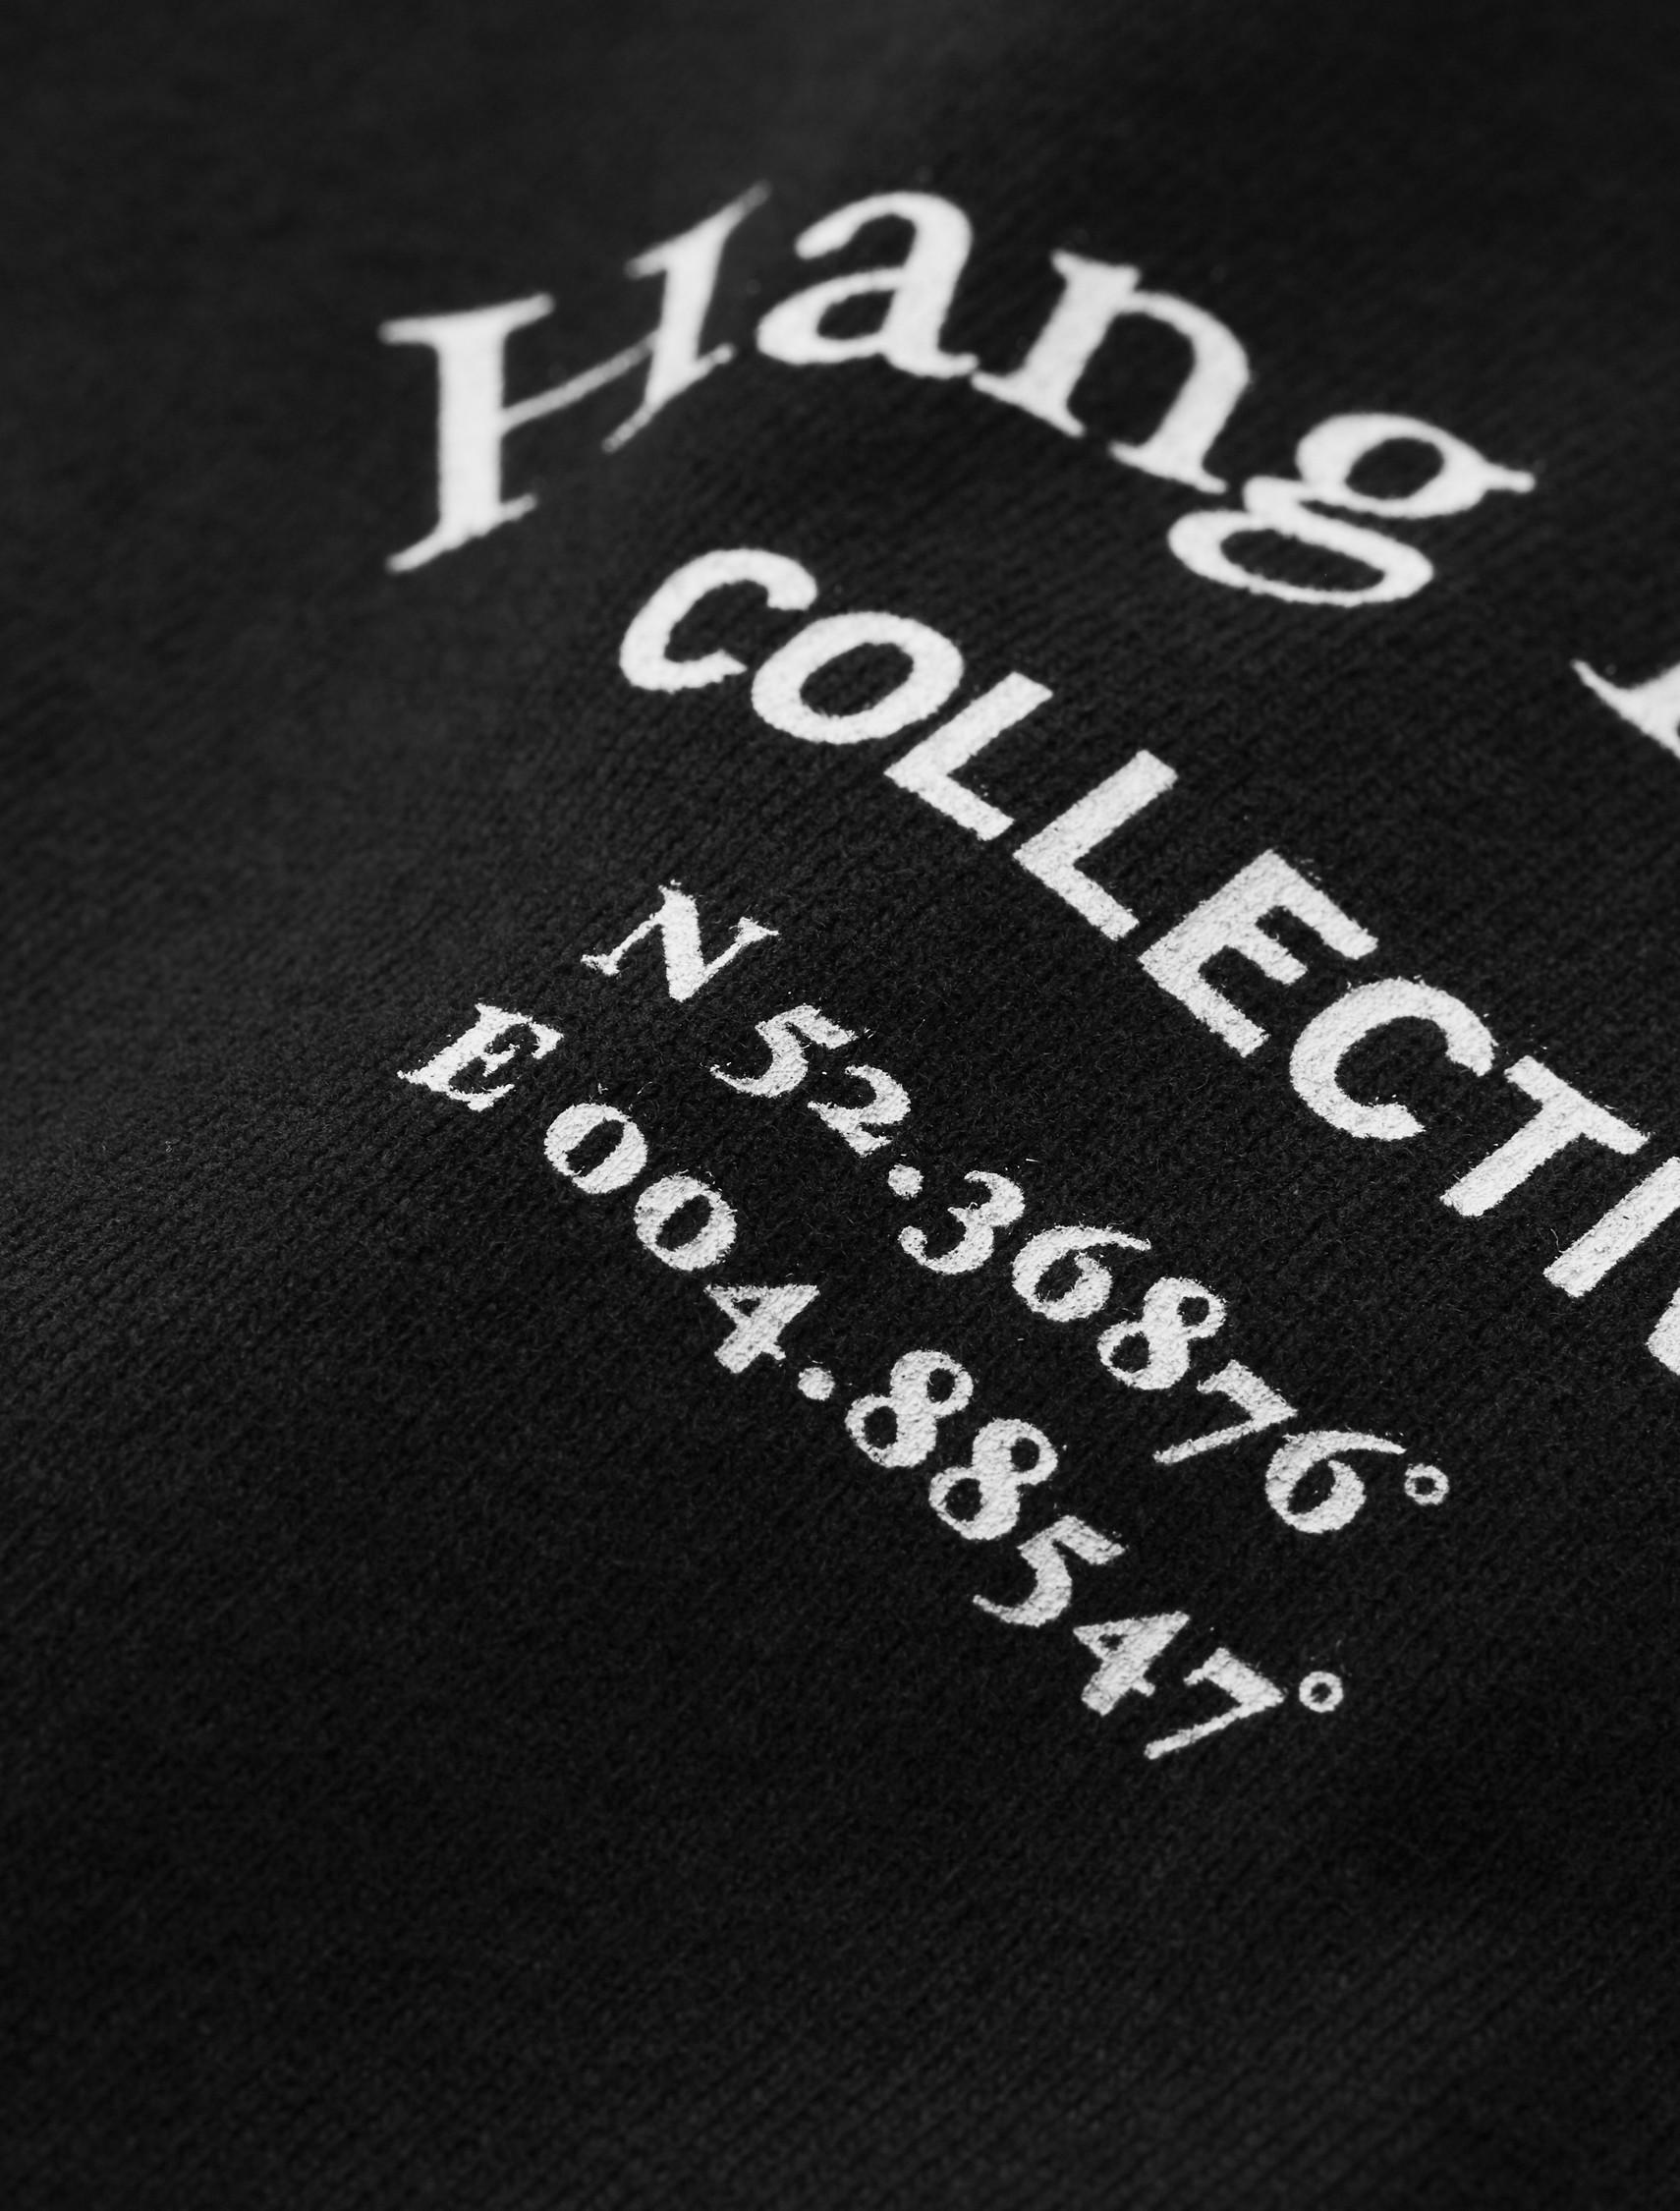 Collective Tee - Black